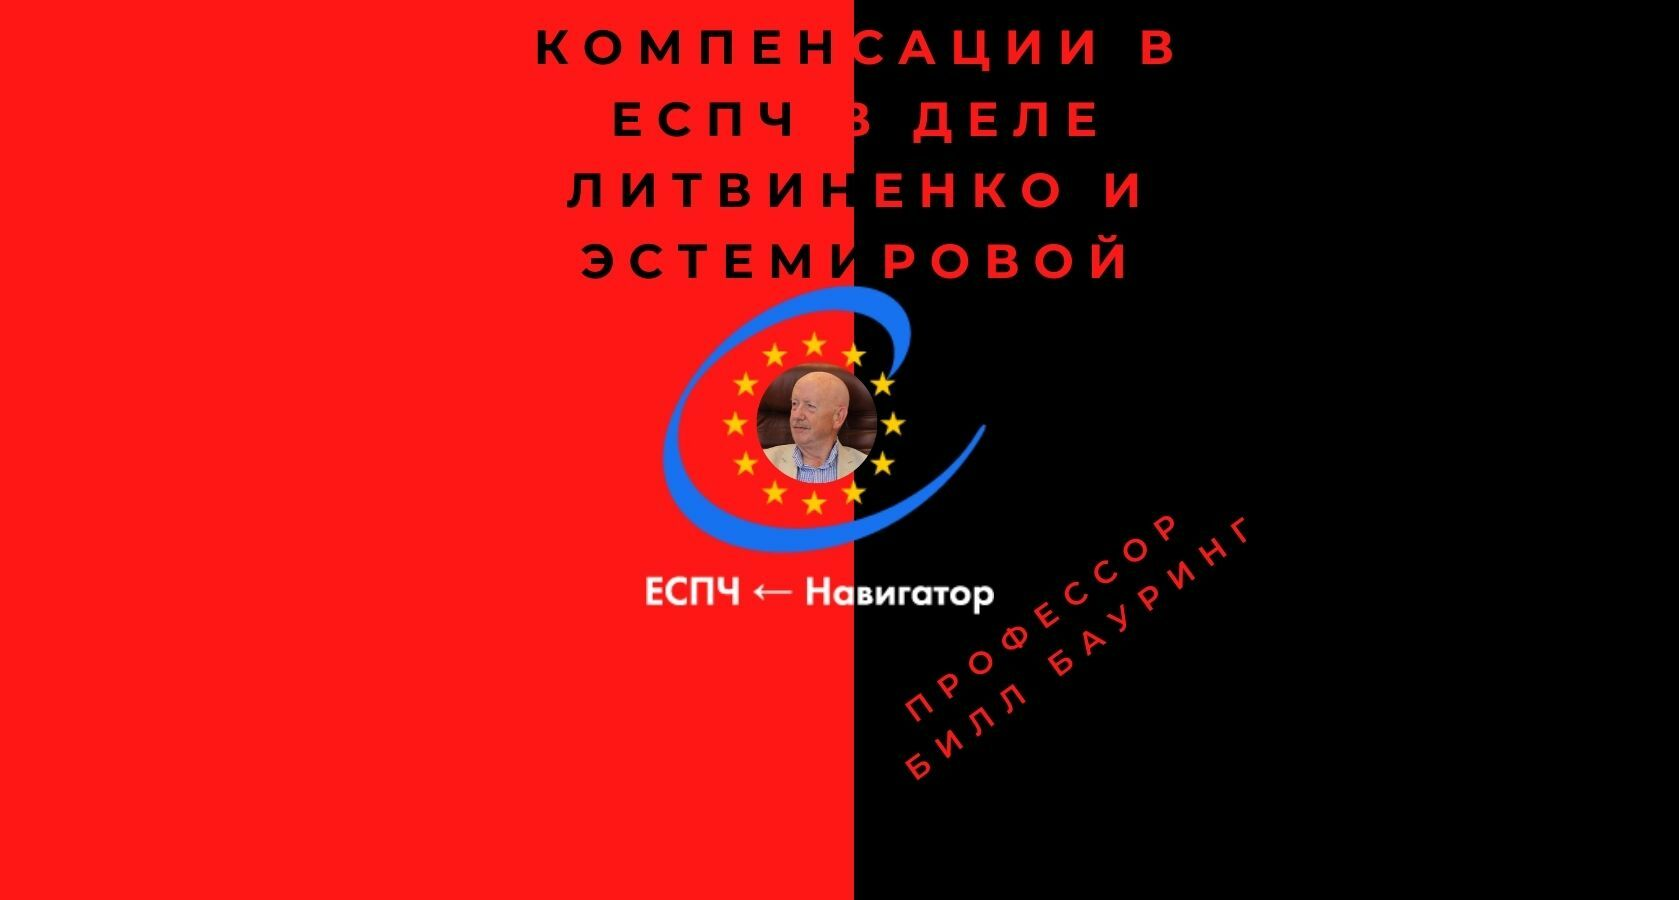 Литвиненко (Картер) против России